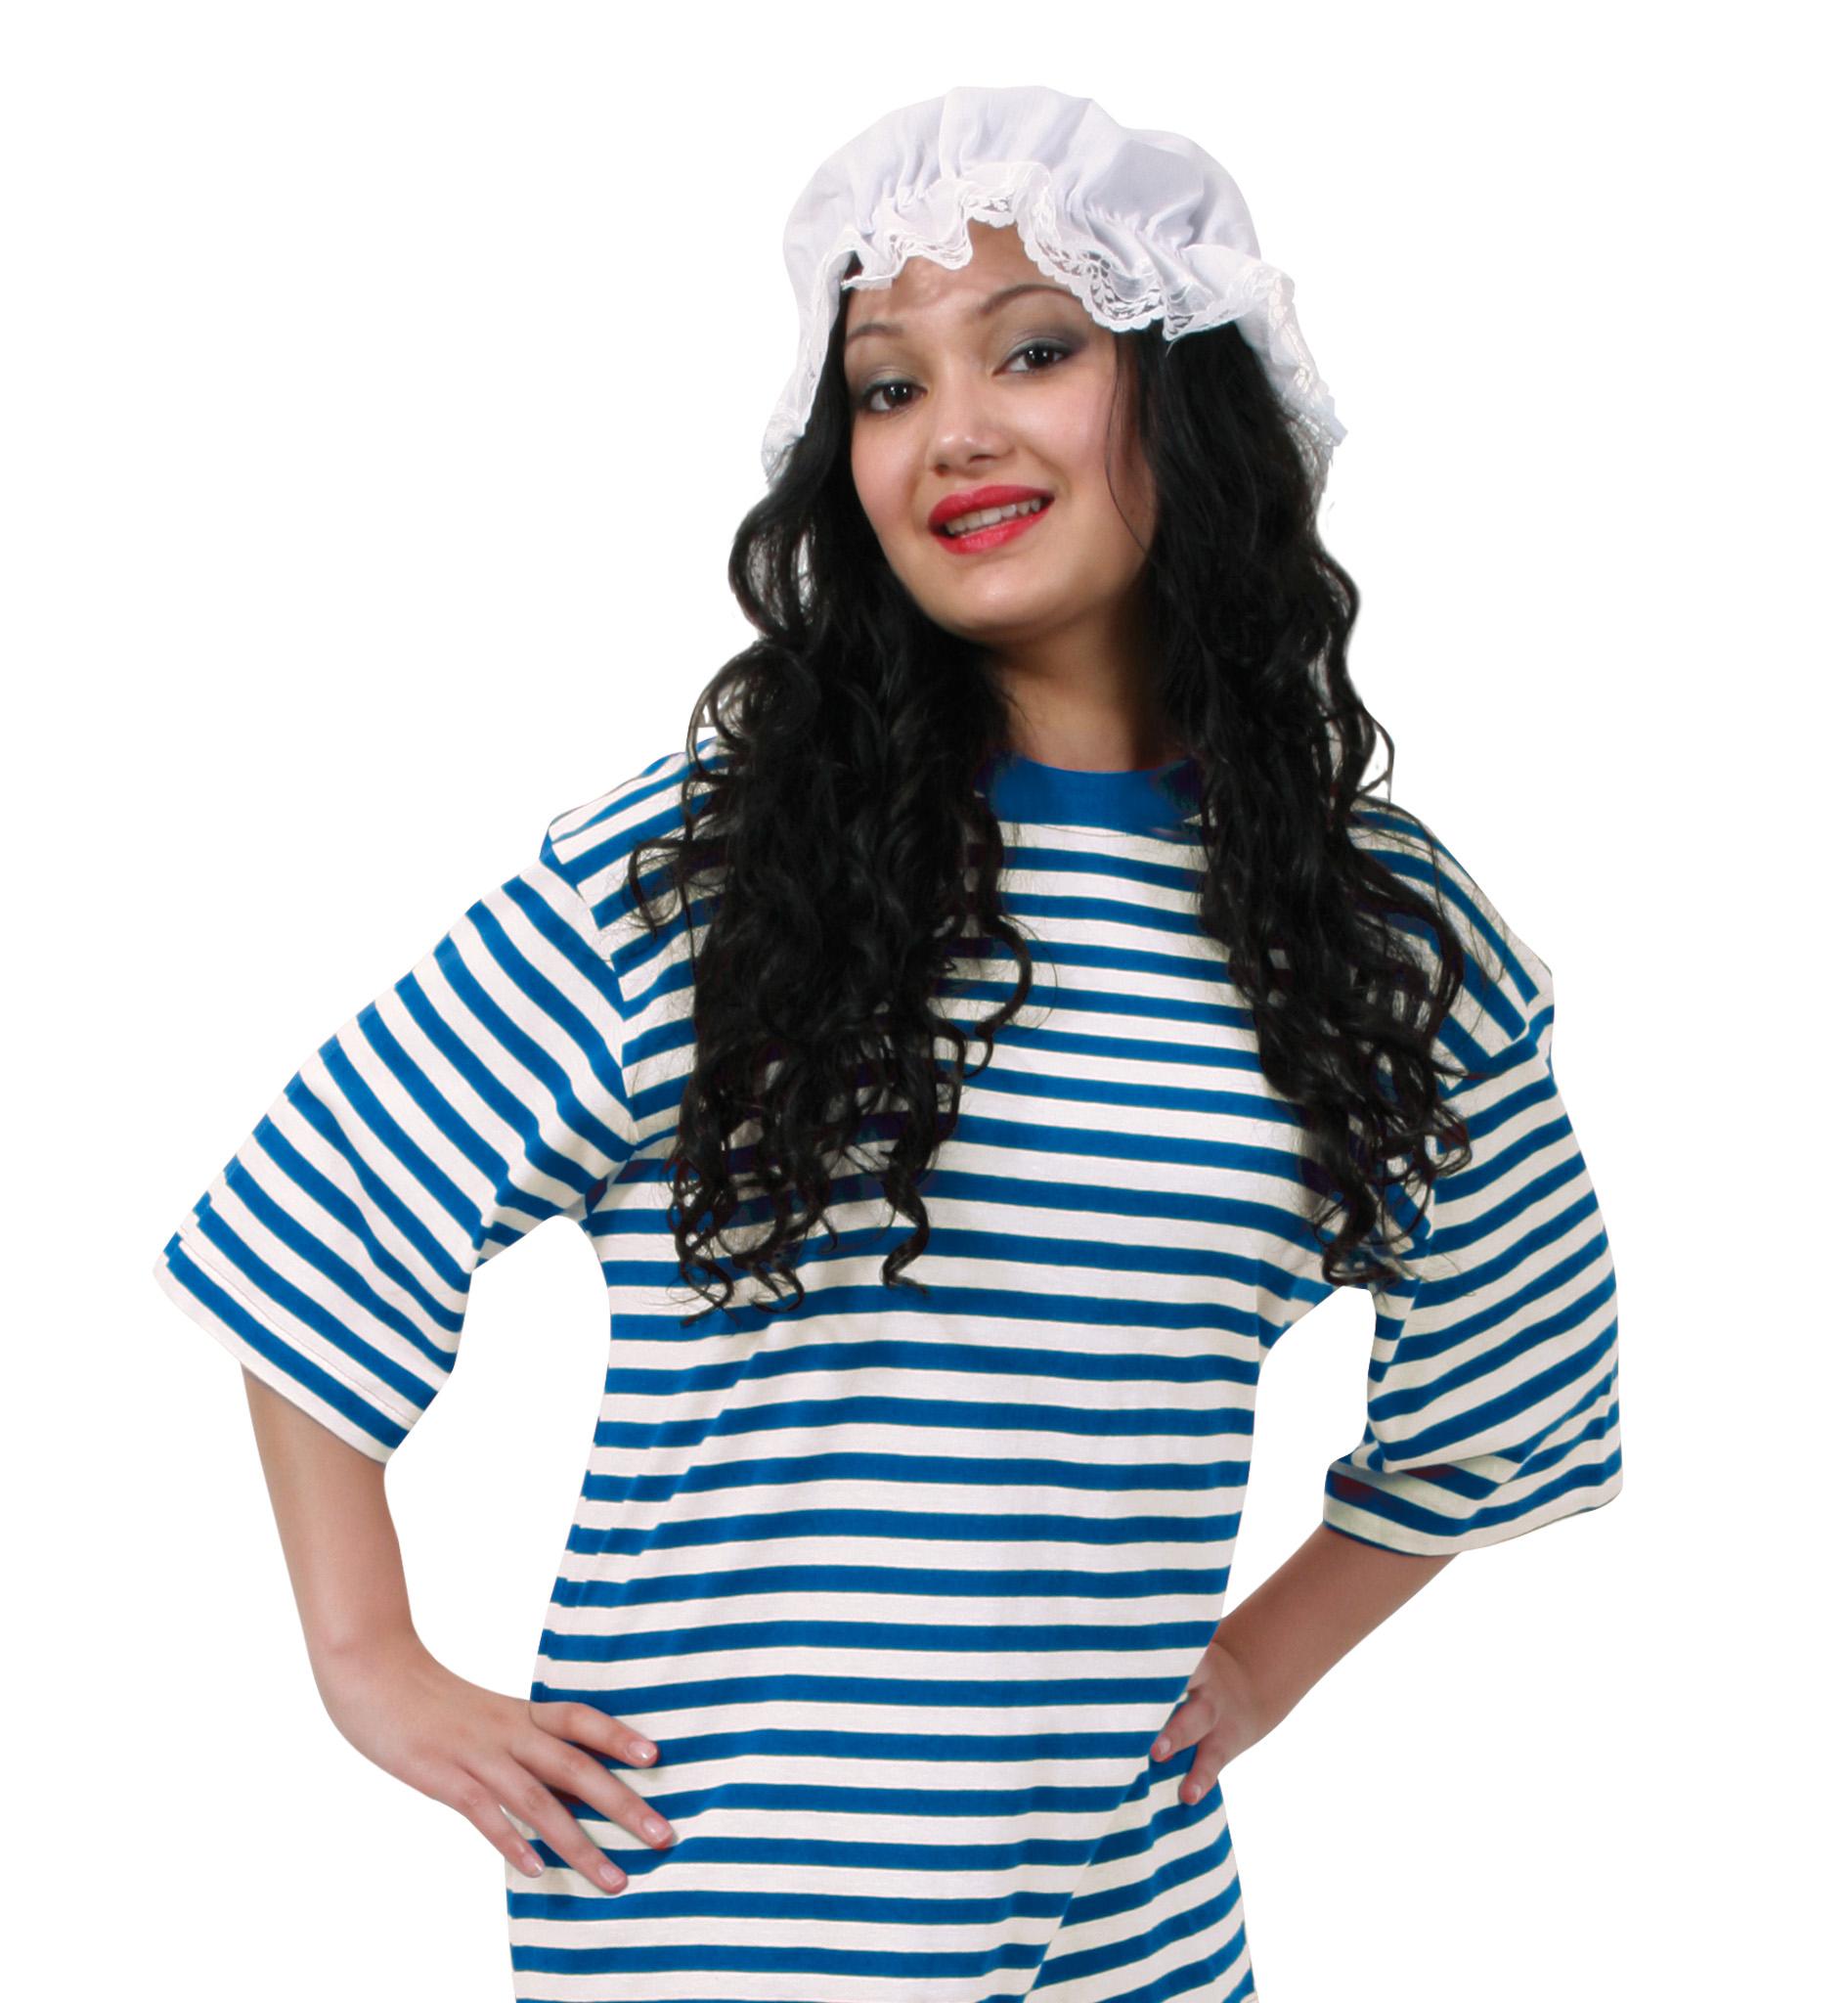 0efb5a9bae ... blau/weiß, Schlafwandler, Clown. Kostüm - Set Schlafmütze, 2-TLG.  Ringel-Shirt Kurzarm (Baumwolle)